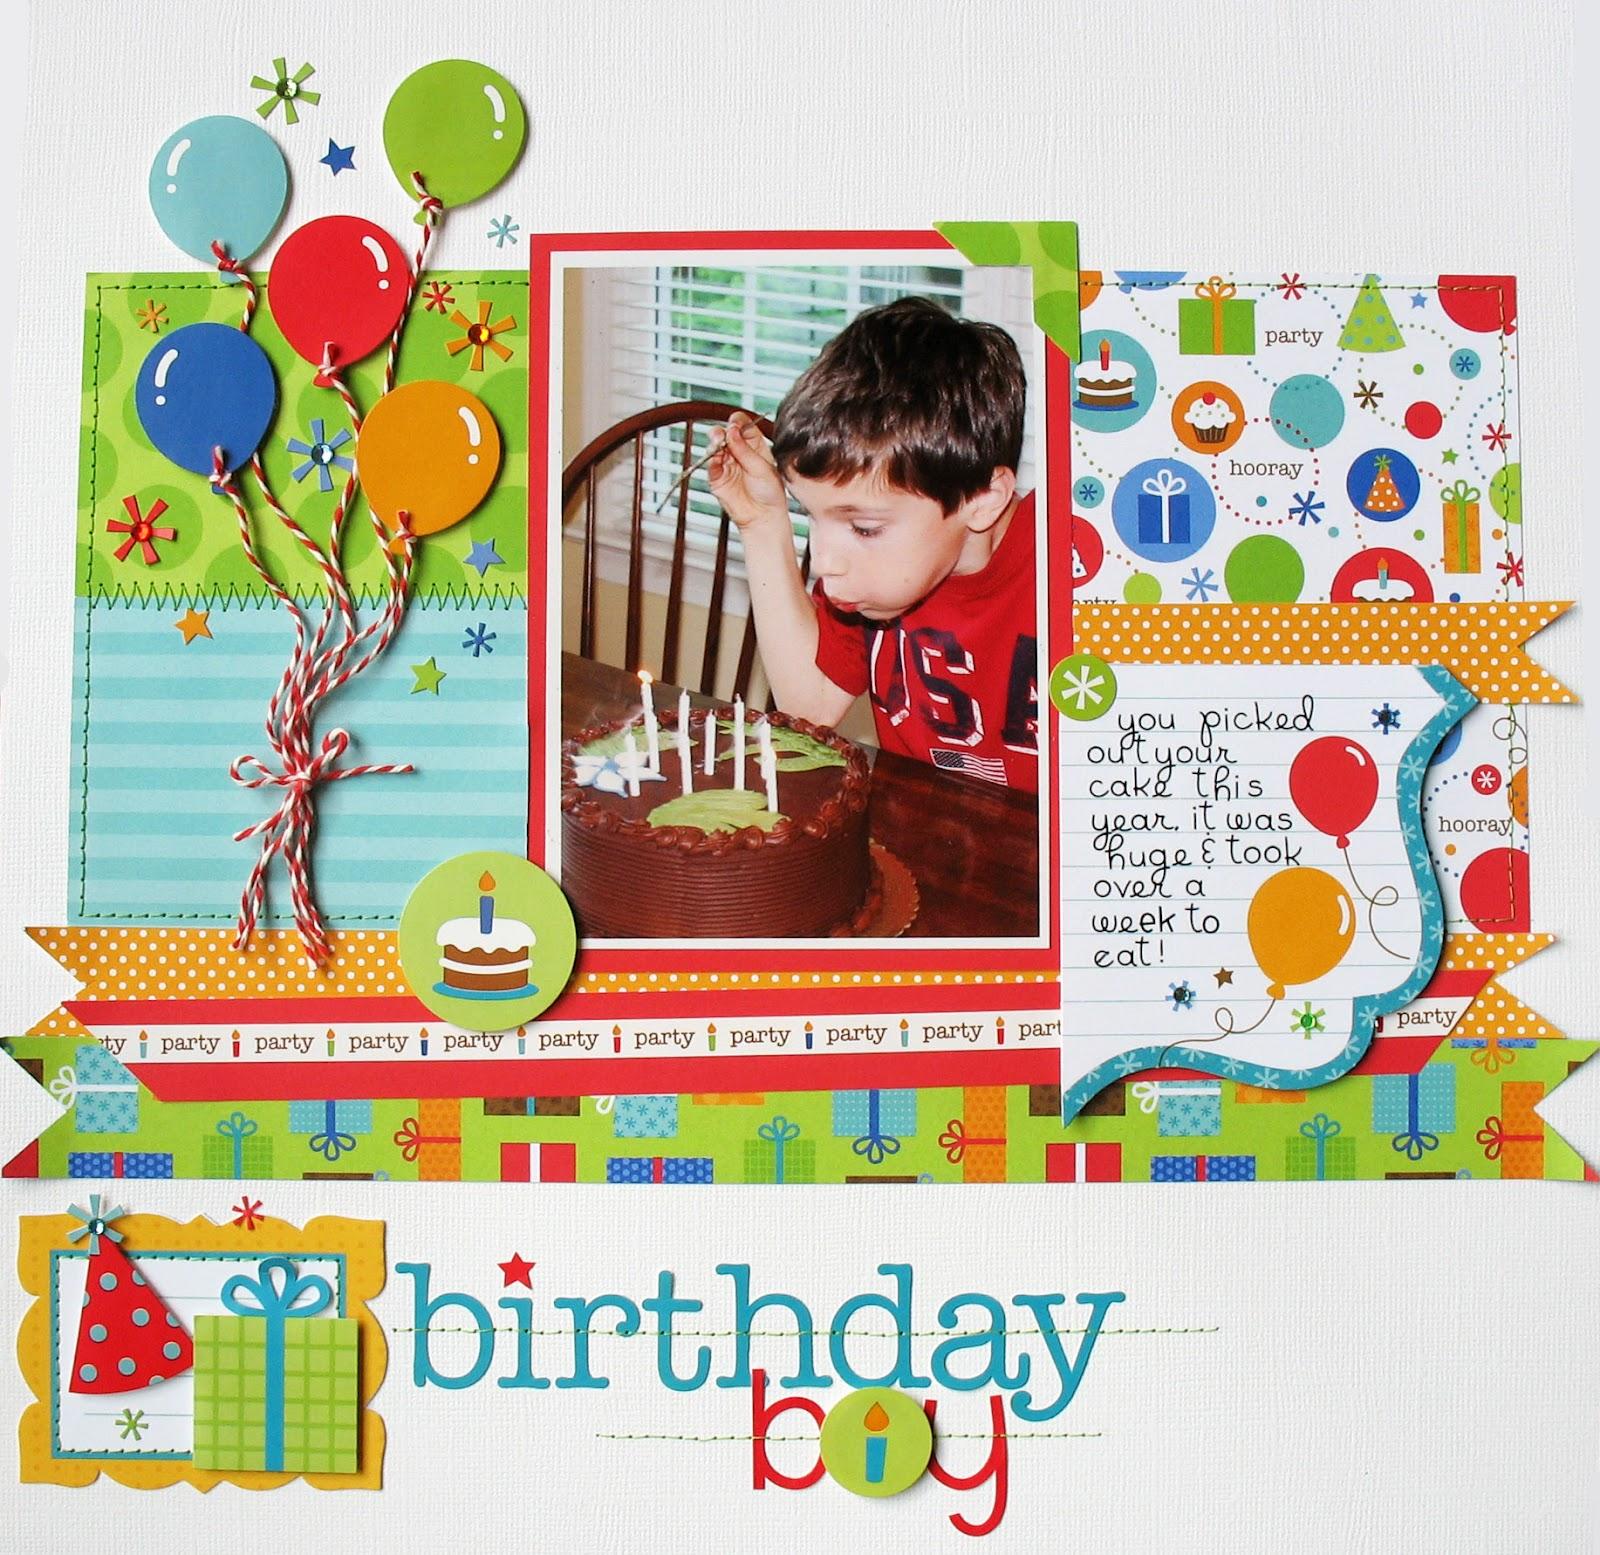 Doodlebug Design Inc Blog: Birthday Celebration By Kathy